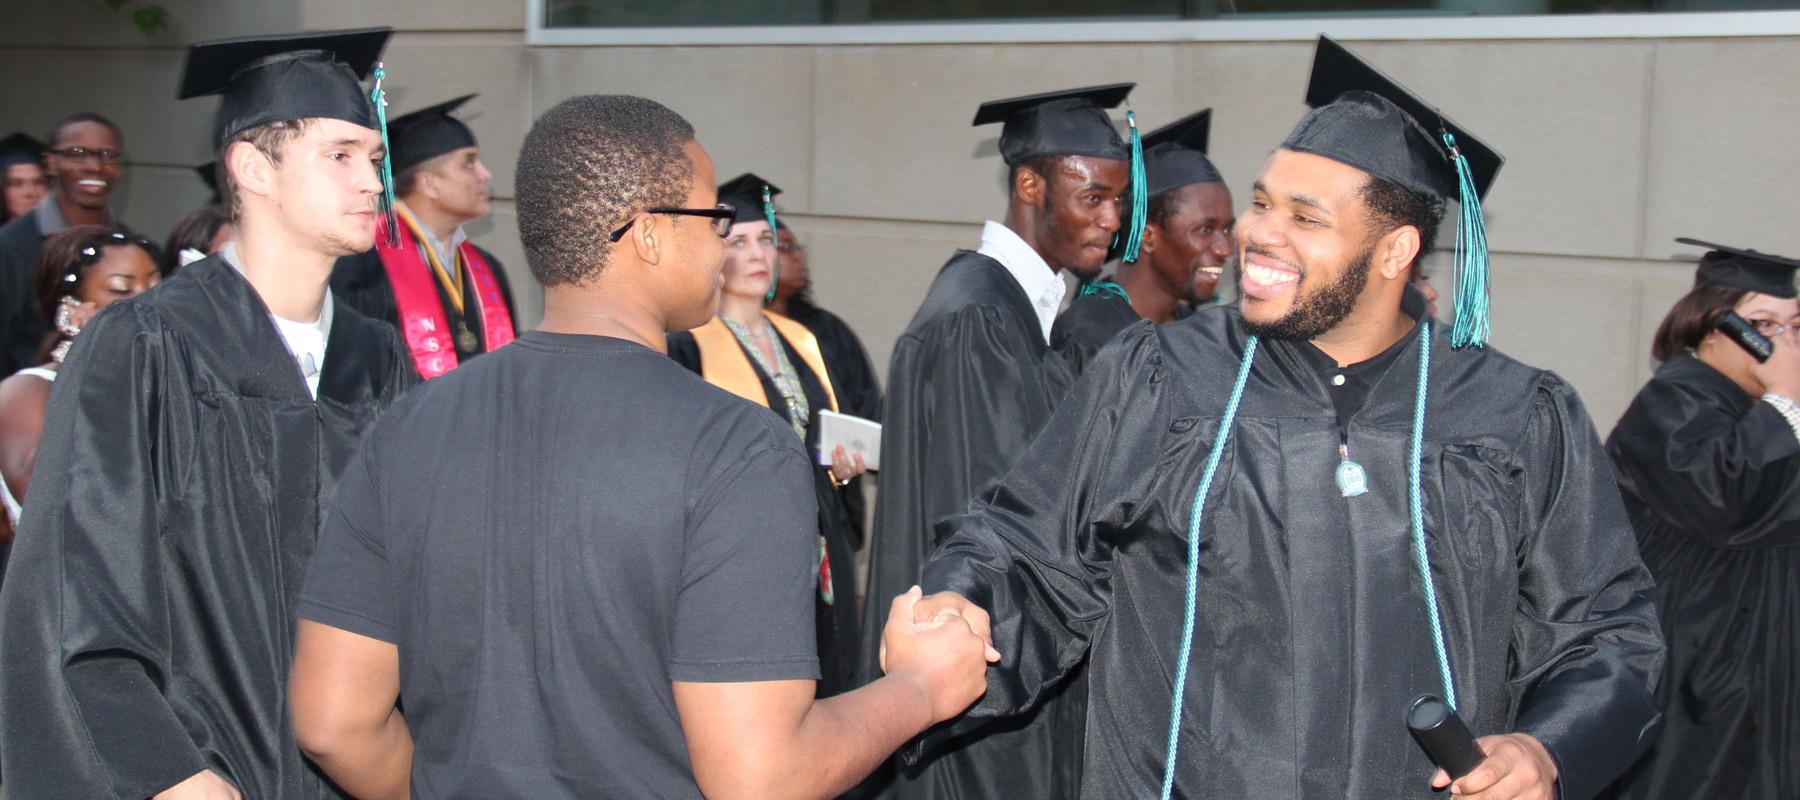 Graduate Shakes Hand